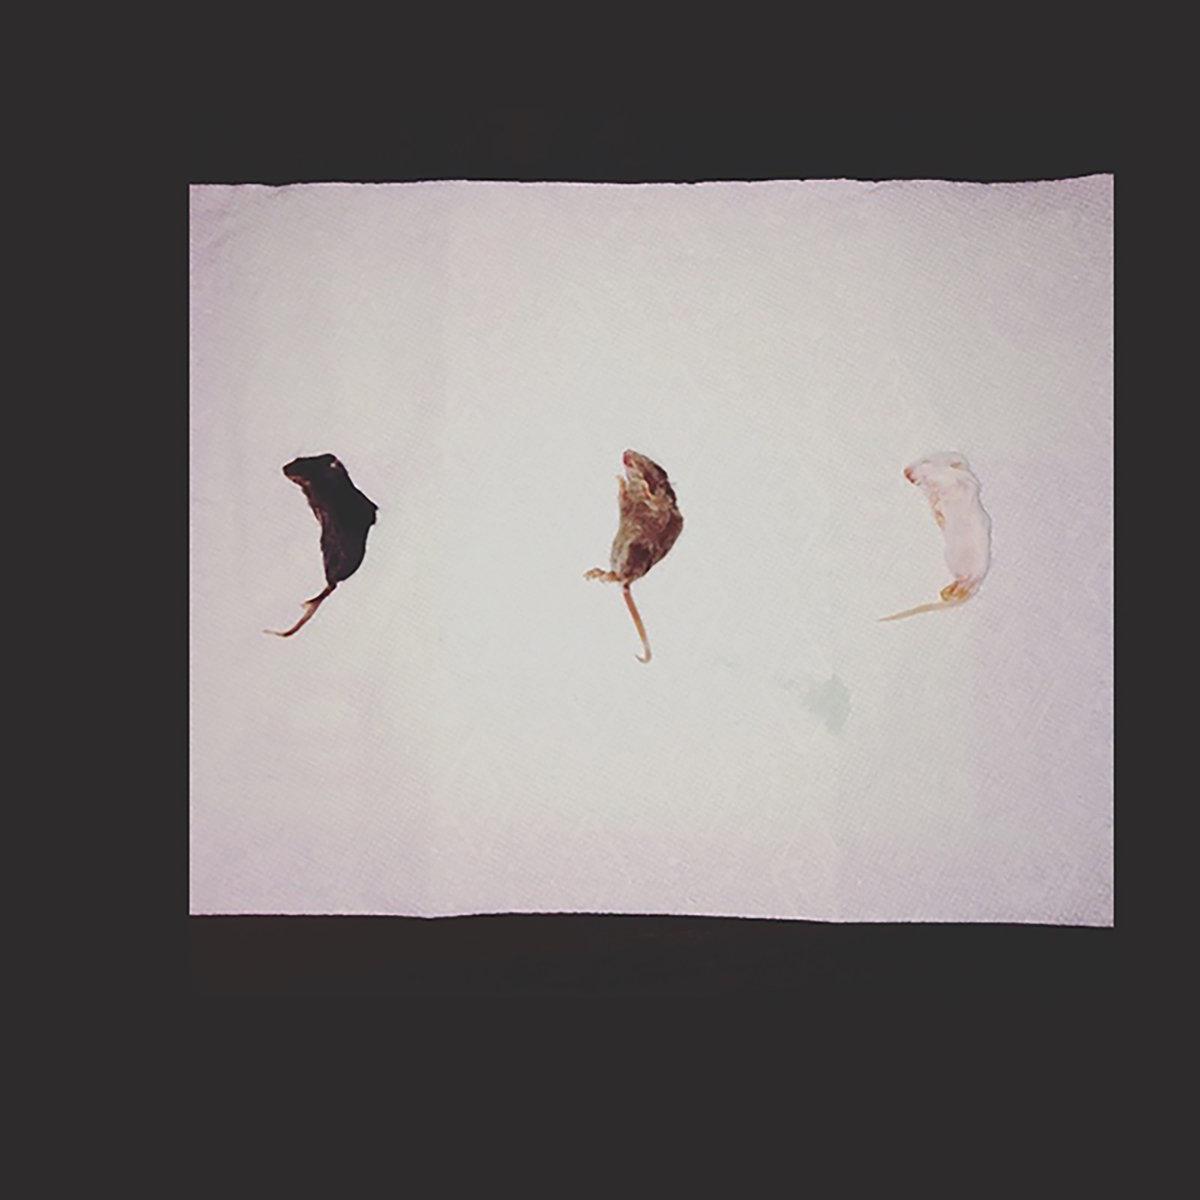 Released: August 6th, 2017 Genres: Garage rock, Math, Surf